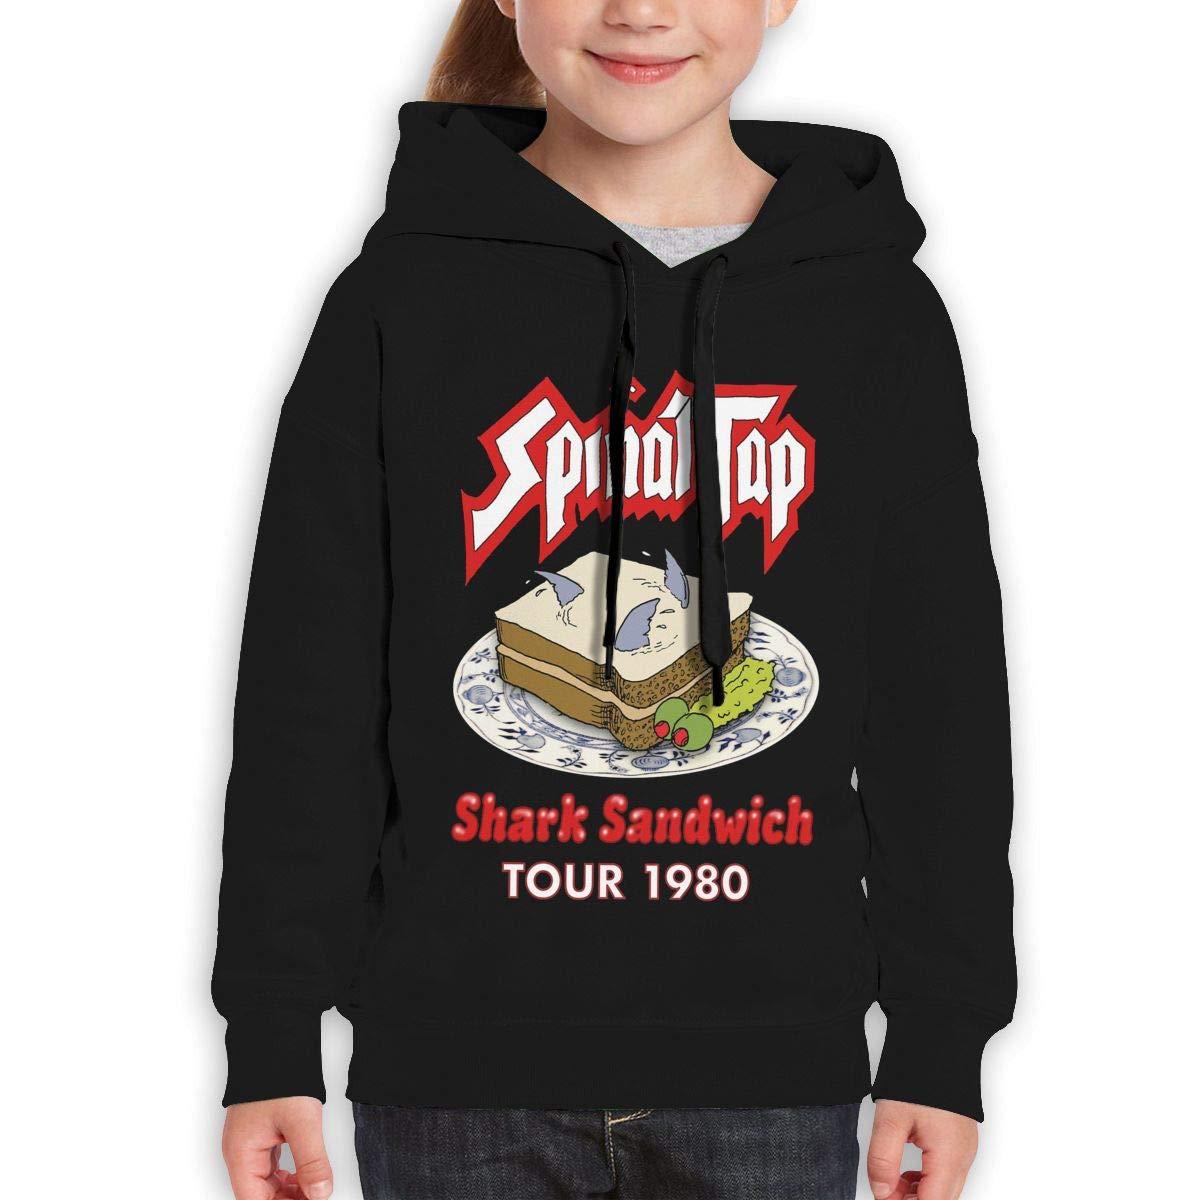 Guiping Spinal Tap Shark Sandwich Tour 1980 Teen Hooded Sweate Sweatshirt Black